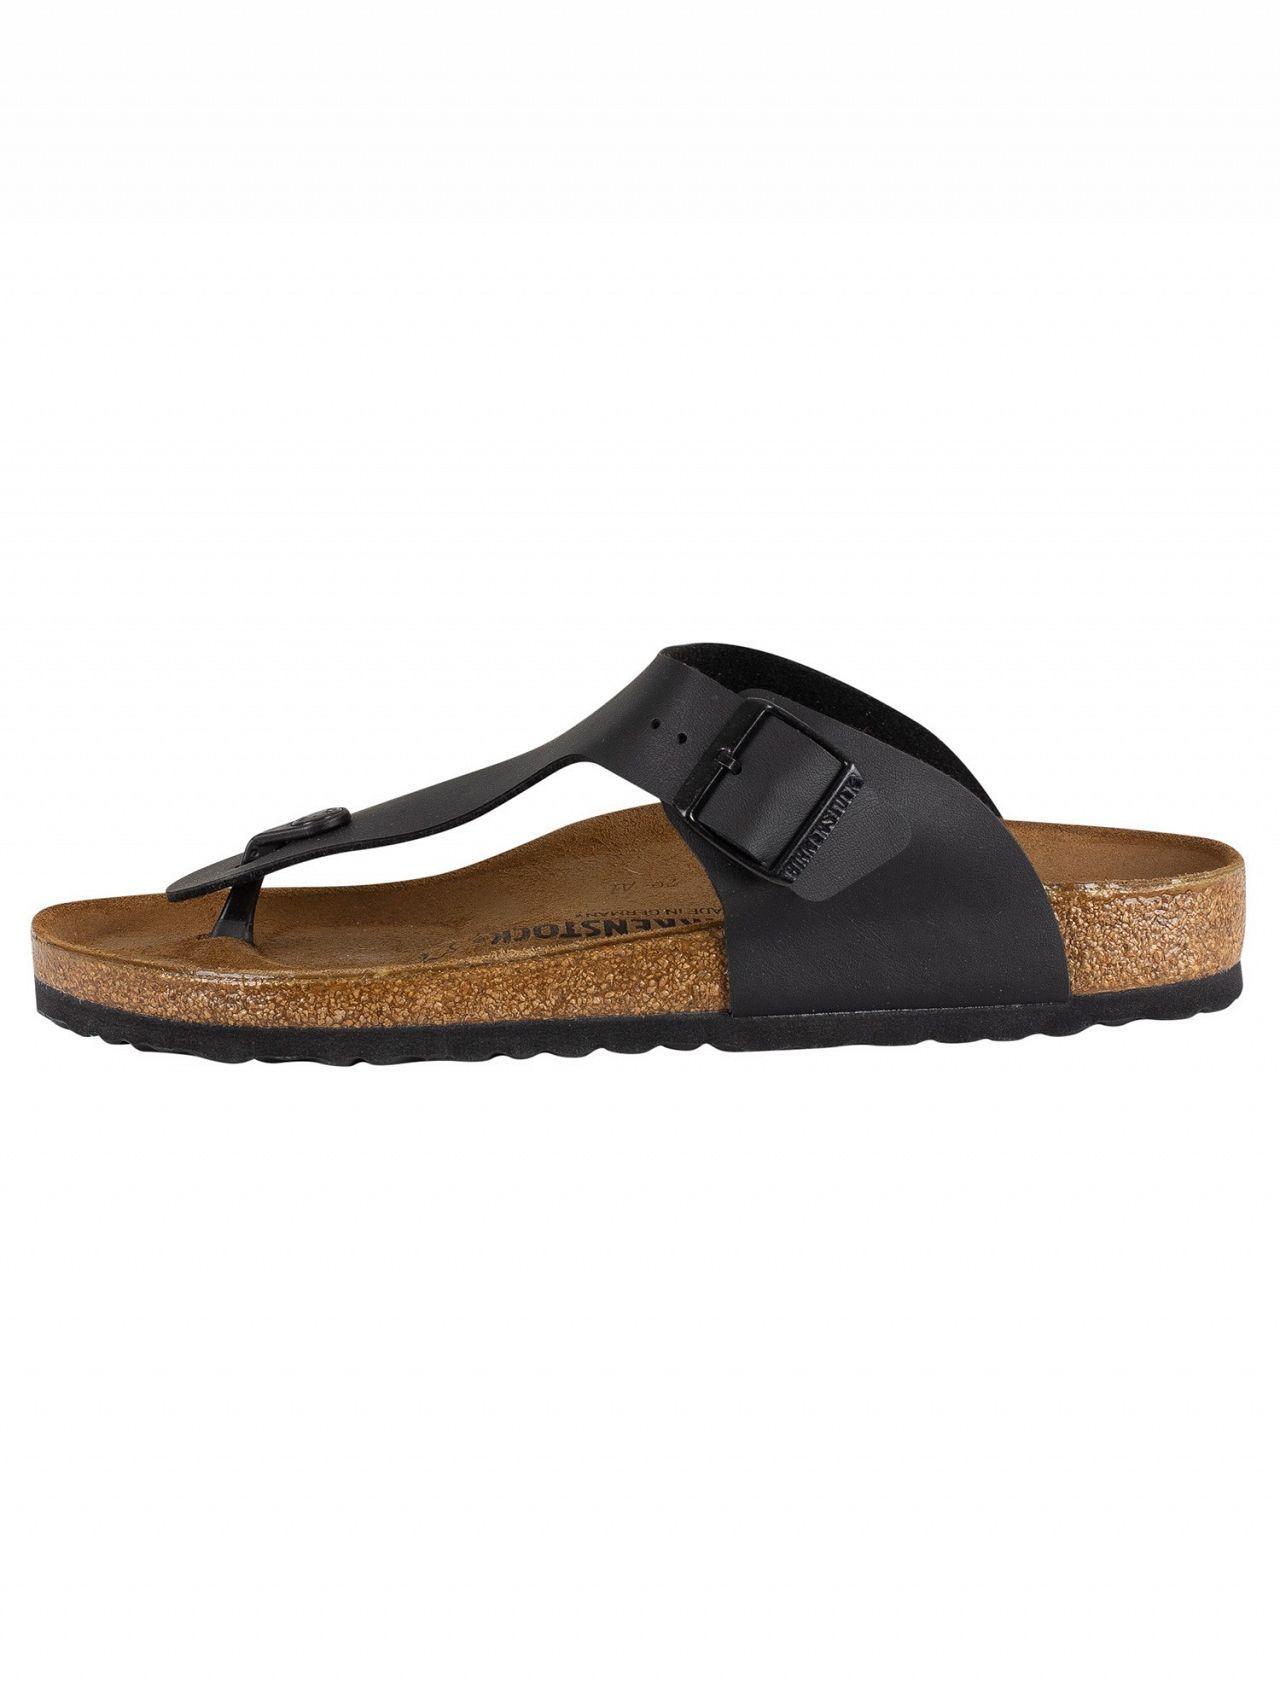 54d33dc2a Tap to visit site. Birkenstock - Men's Ramses Bs Leather Sandals, Black  Men's Mules / Casual Shoes In Black